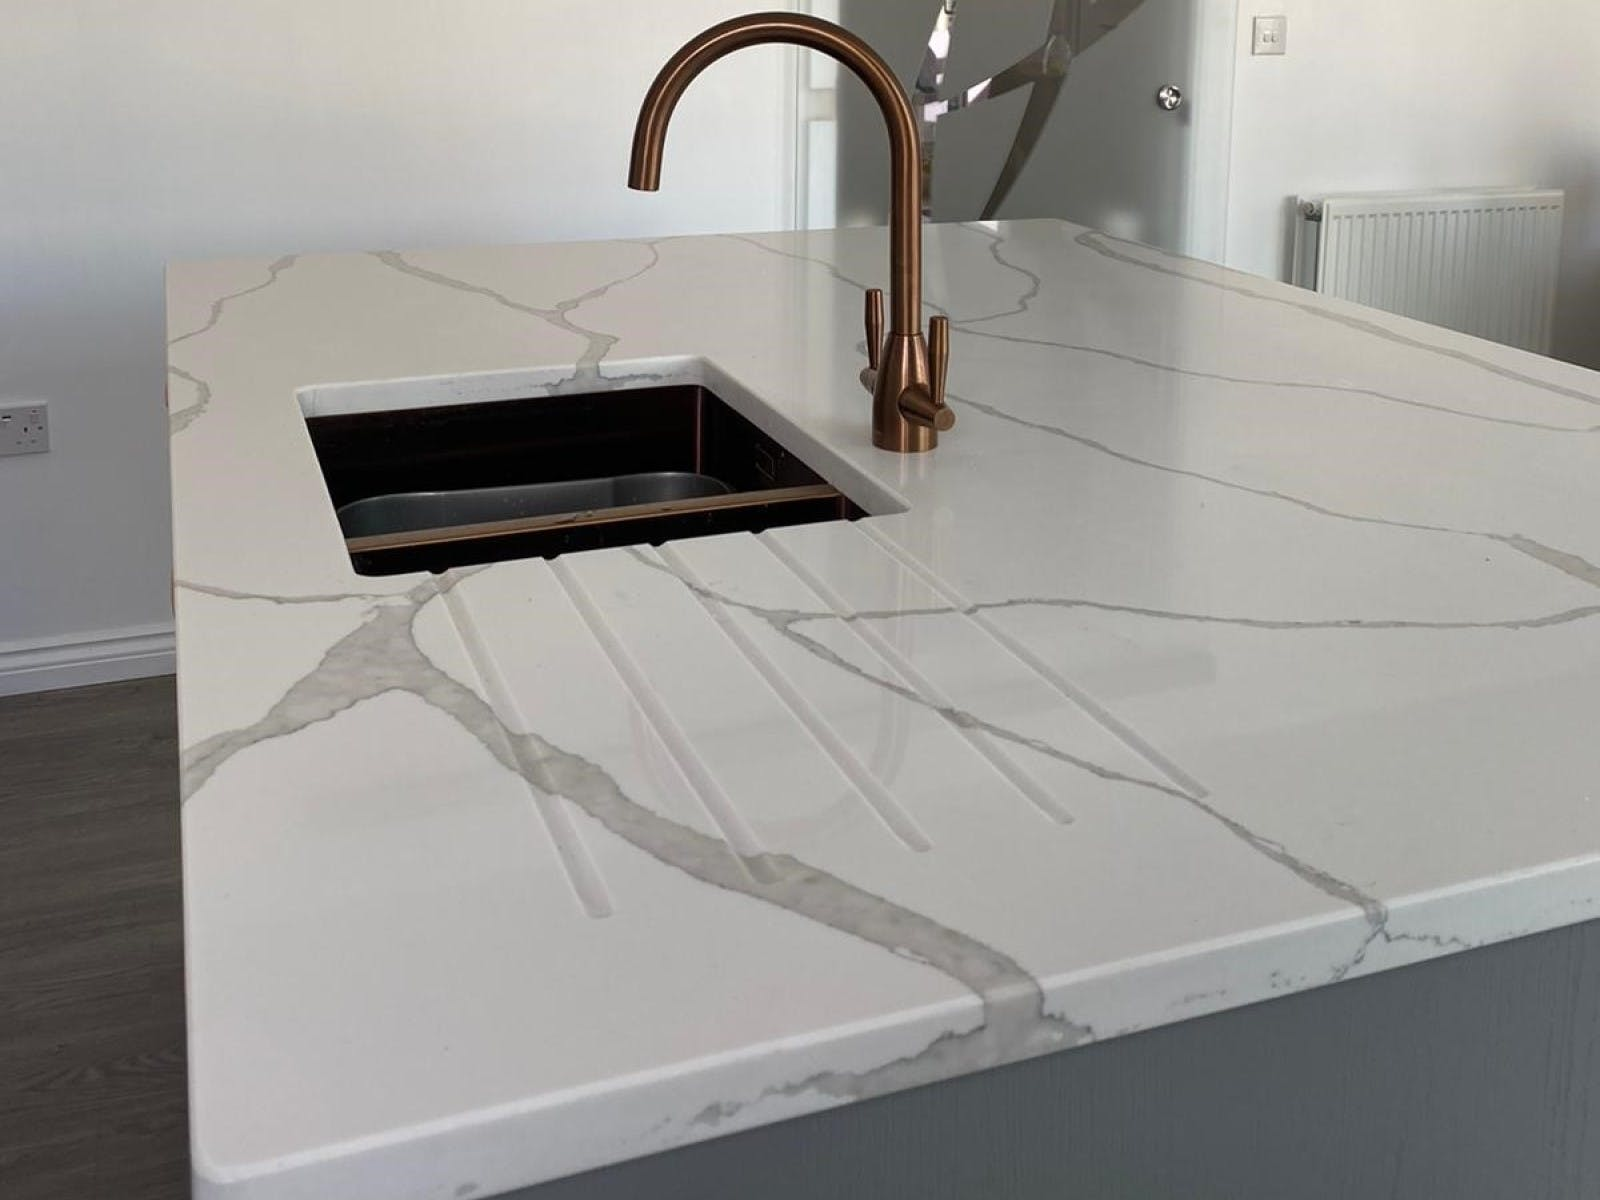 Calacatta Quartz Worktop WIth Copper Tap and Sink, Sheffield